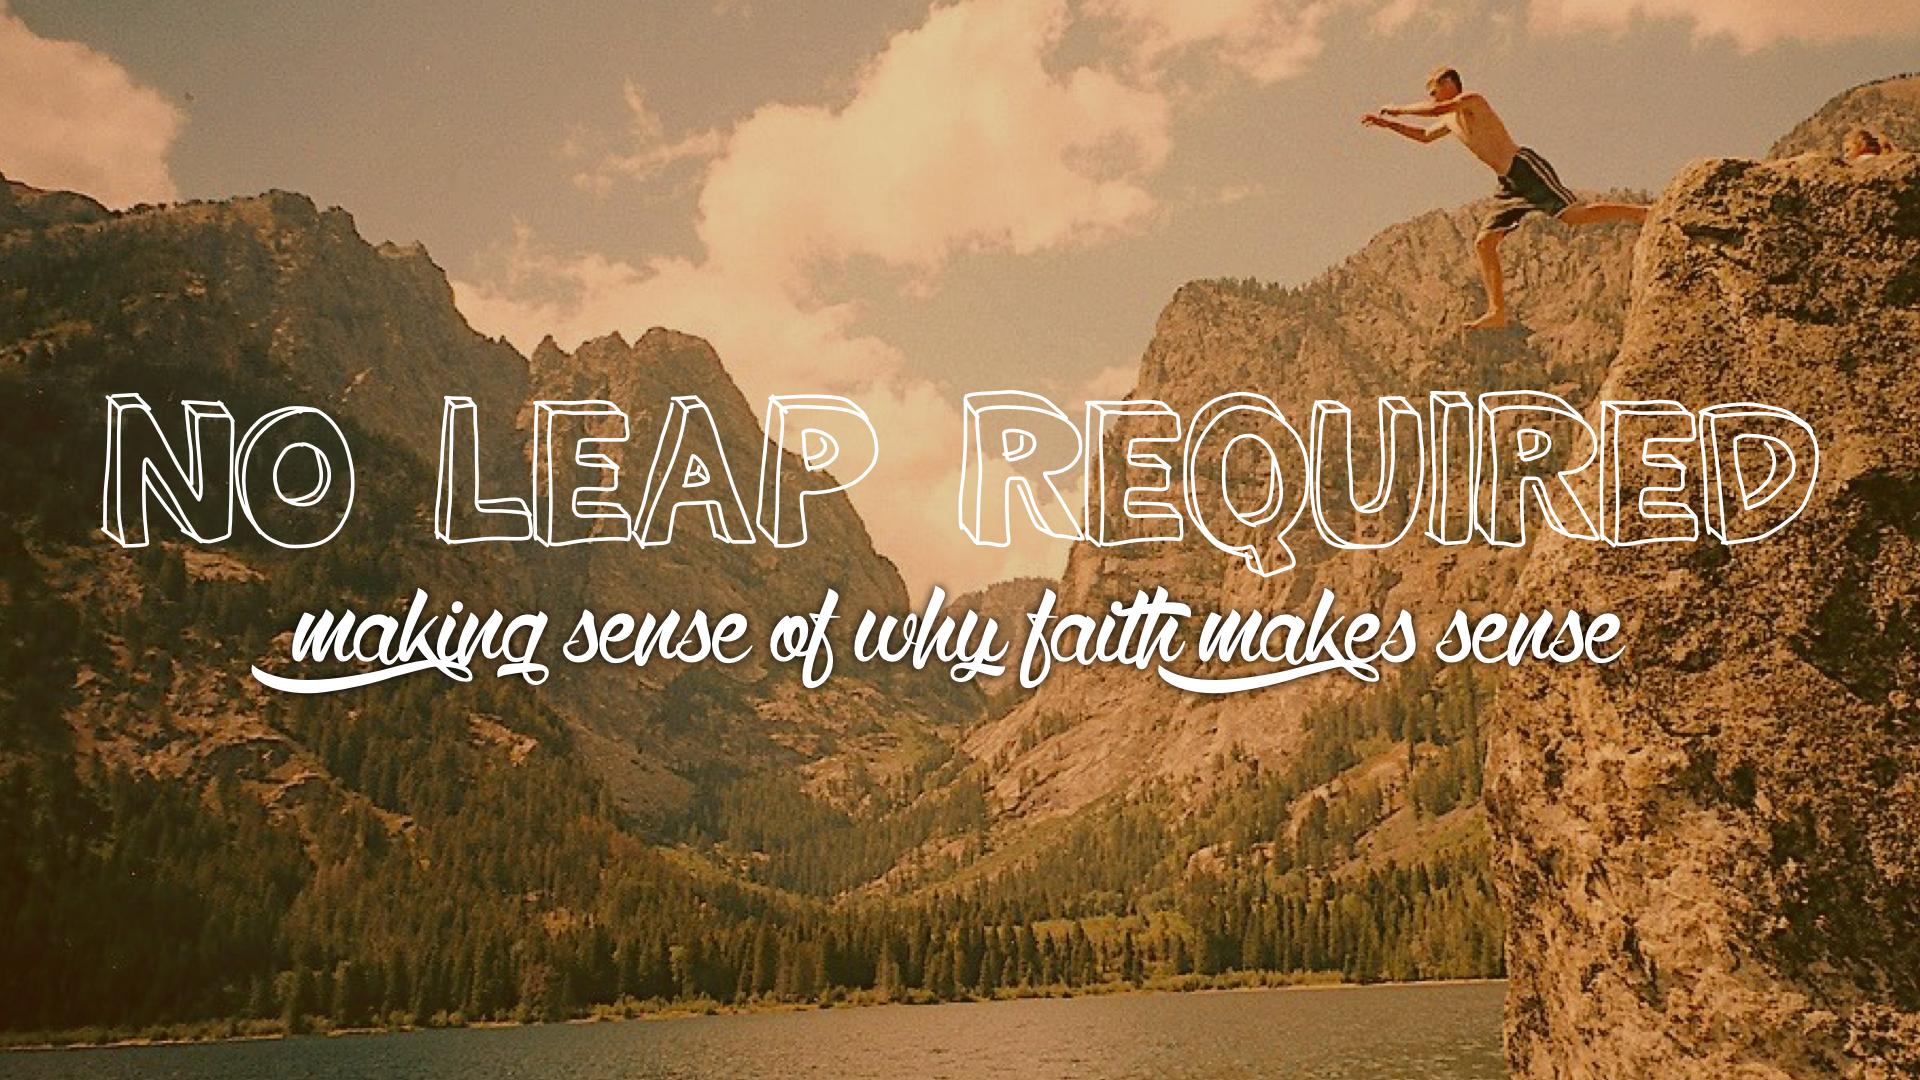 No Leap Required Instagram.jpg